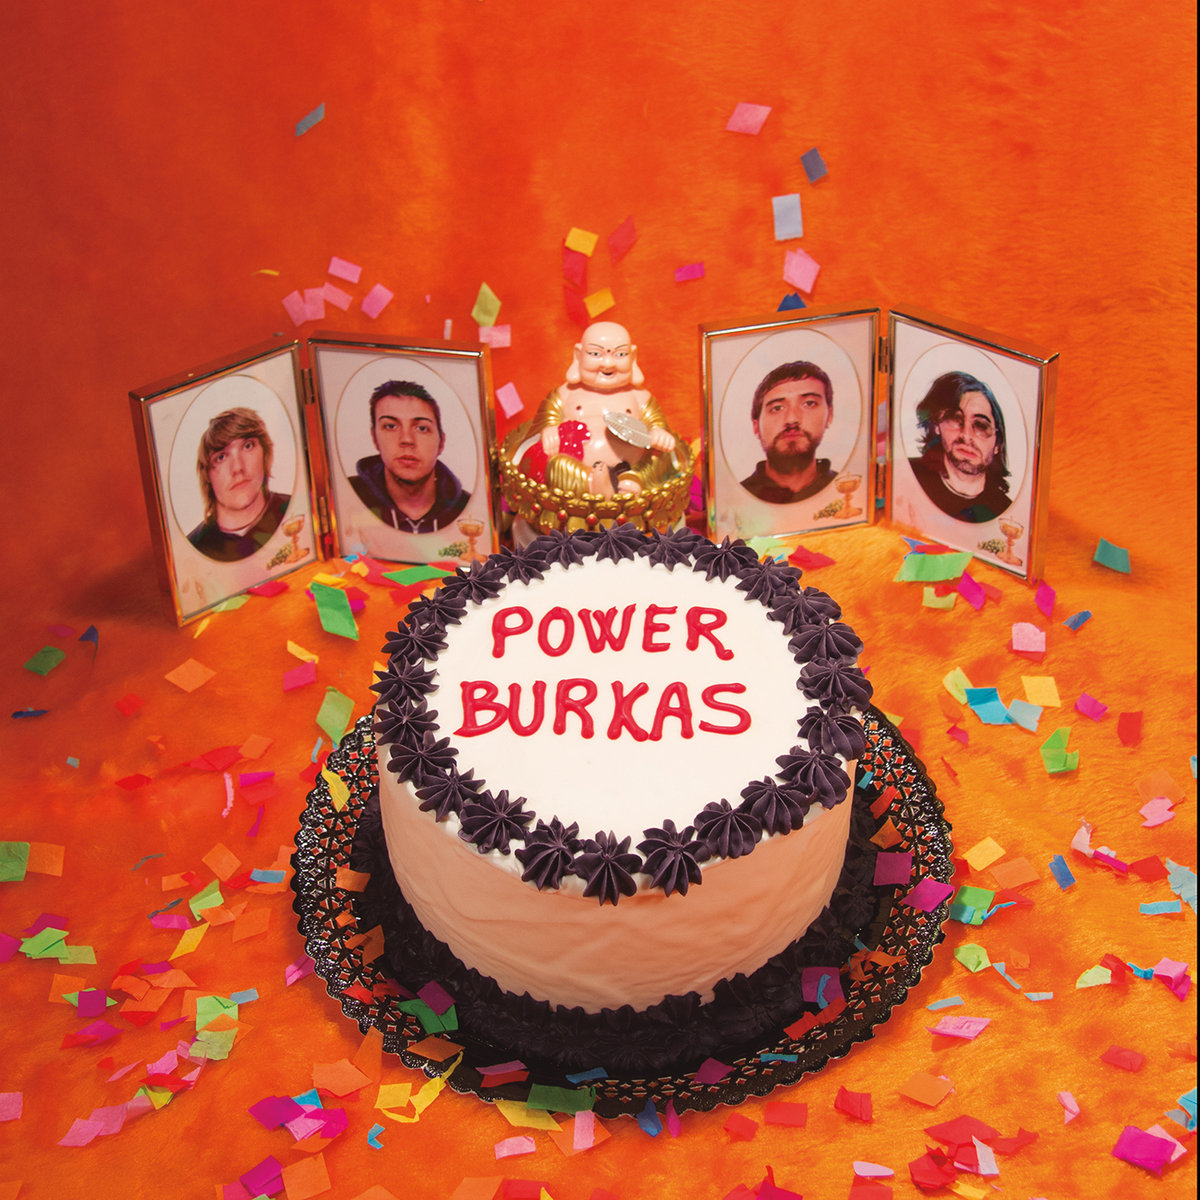 Power Burkas - Llarga Vida Al Tarannà